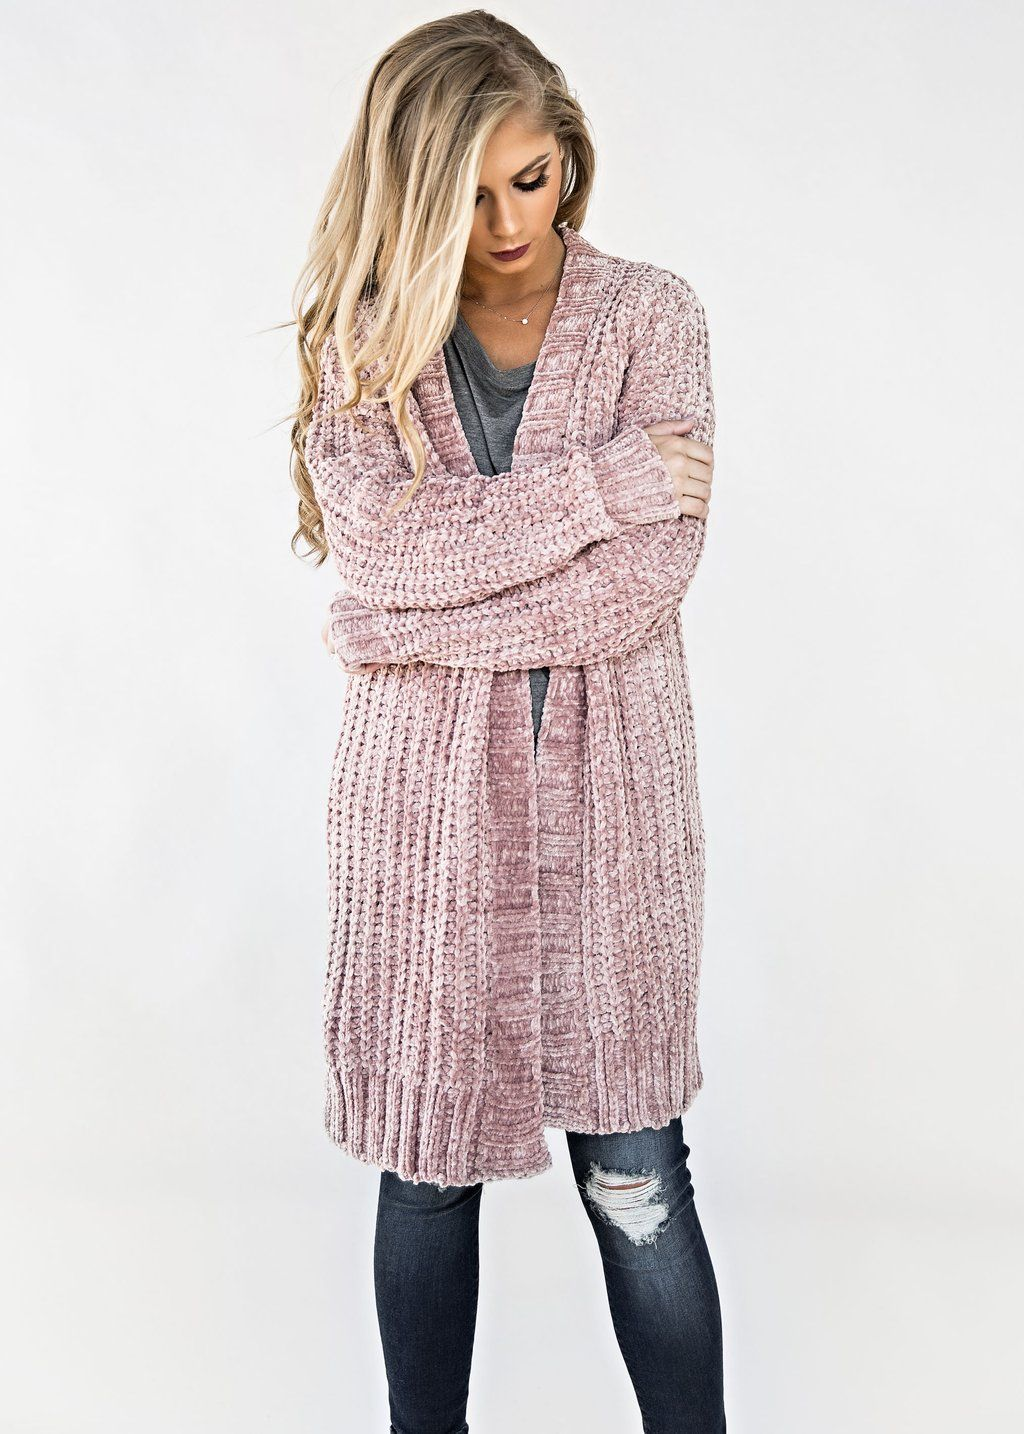 Canyon Knit Cardi | Fashion fall, Fall fashion and Fashion